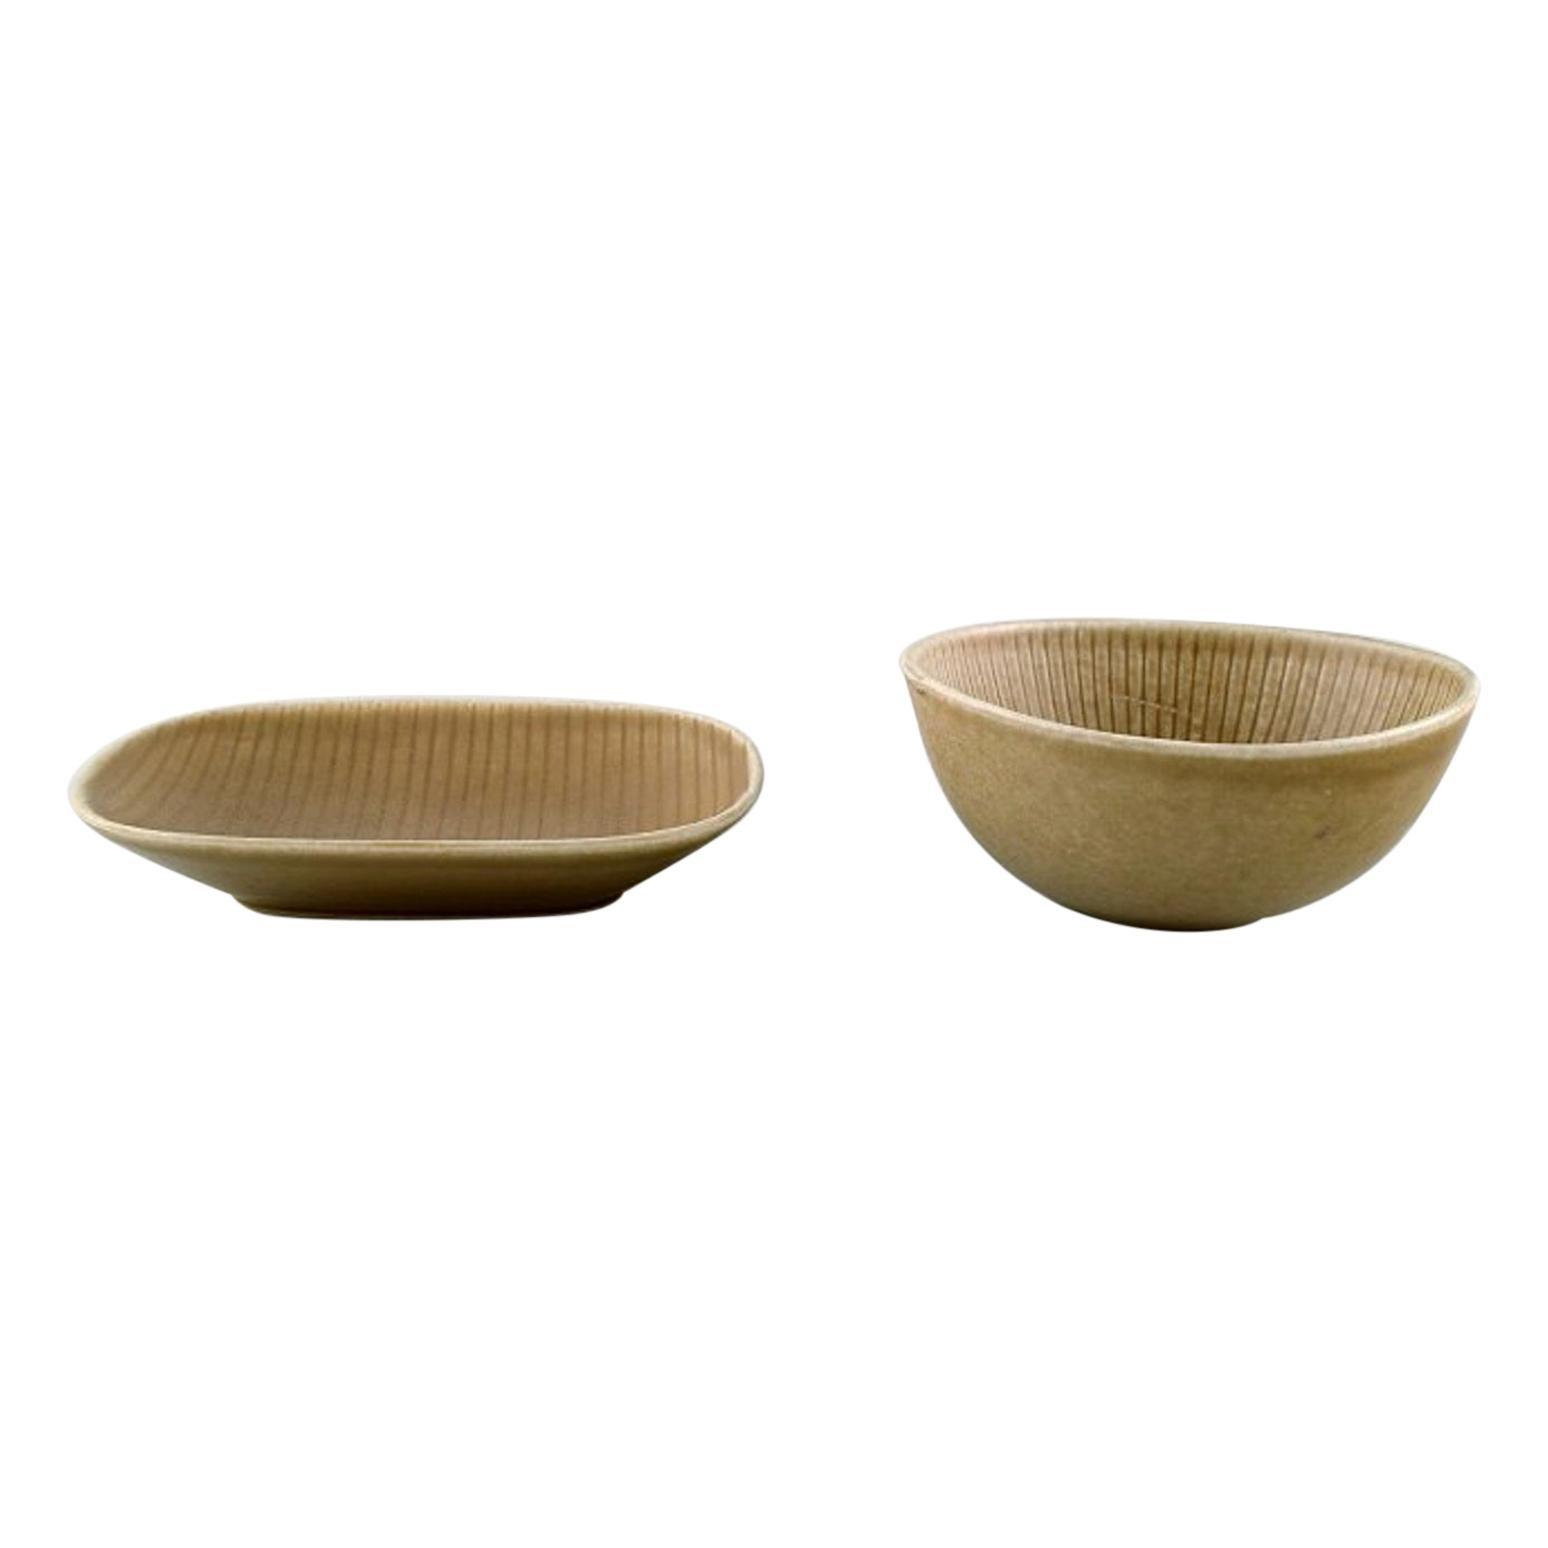 "Two Rörstrand ""Ritzi"" Bowls in Glazed Ceramics, Sweden, 1960s"